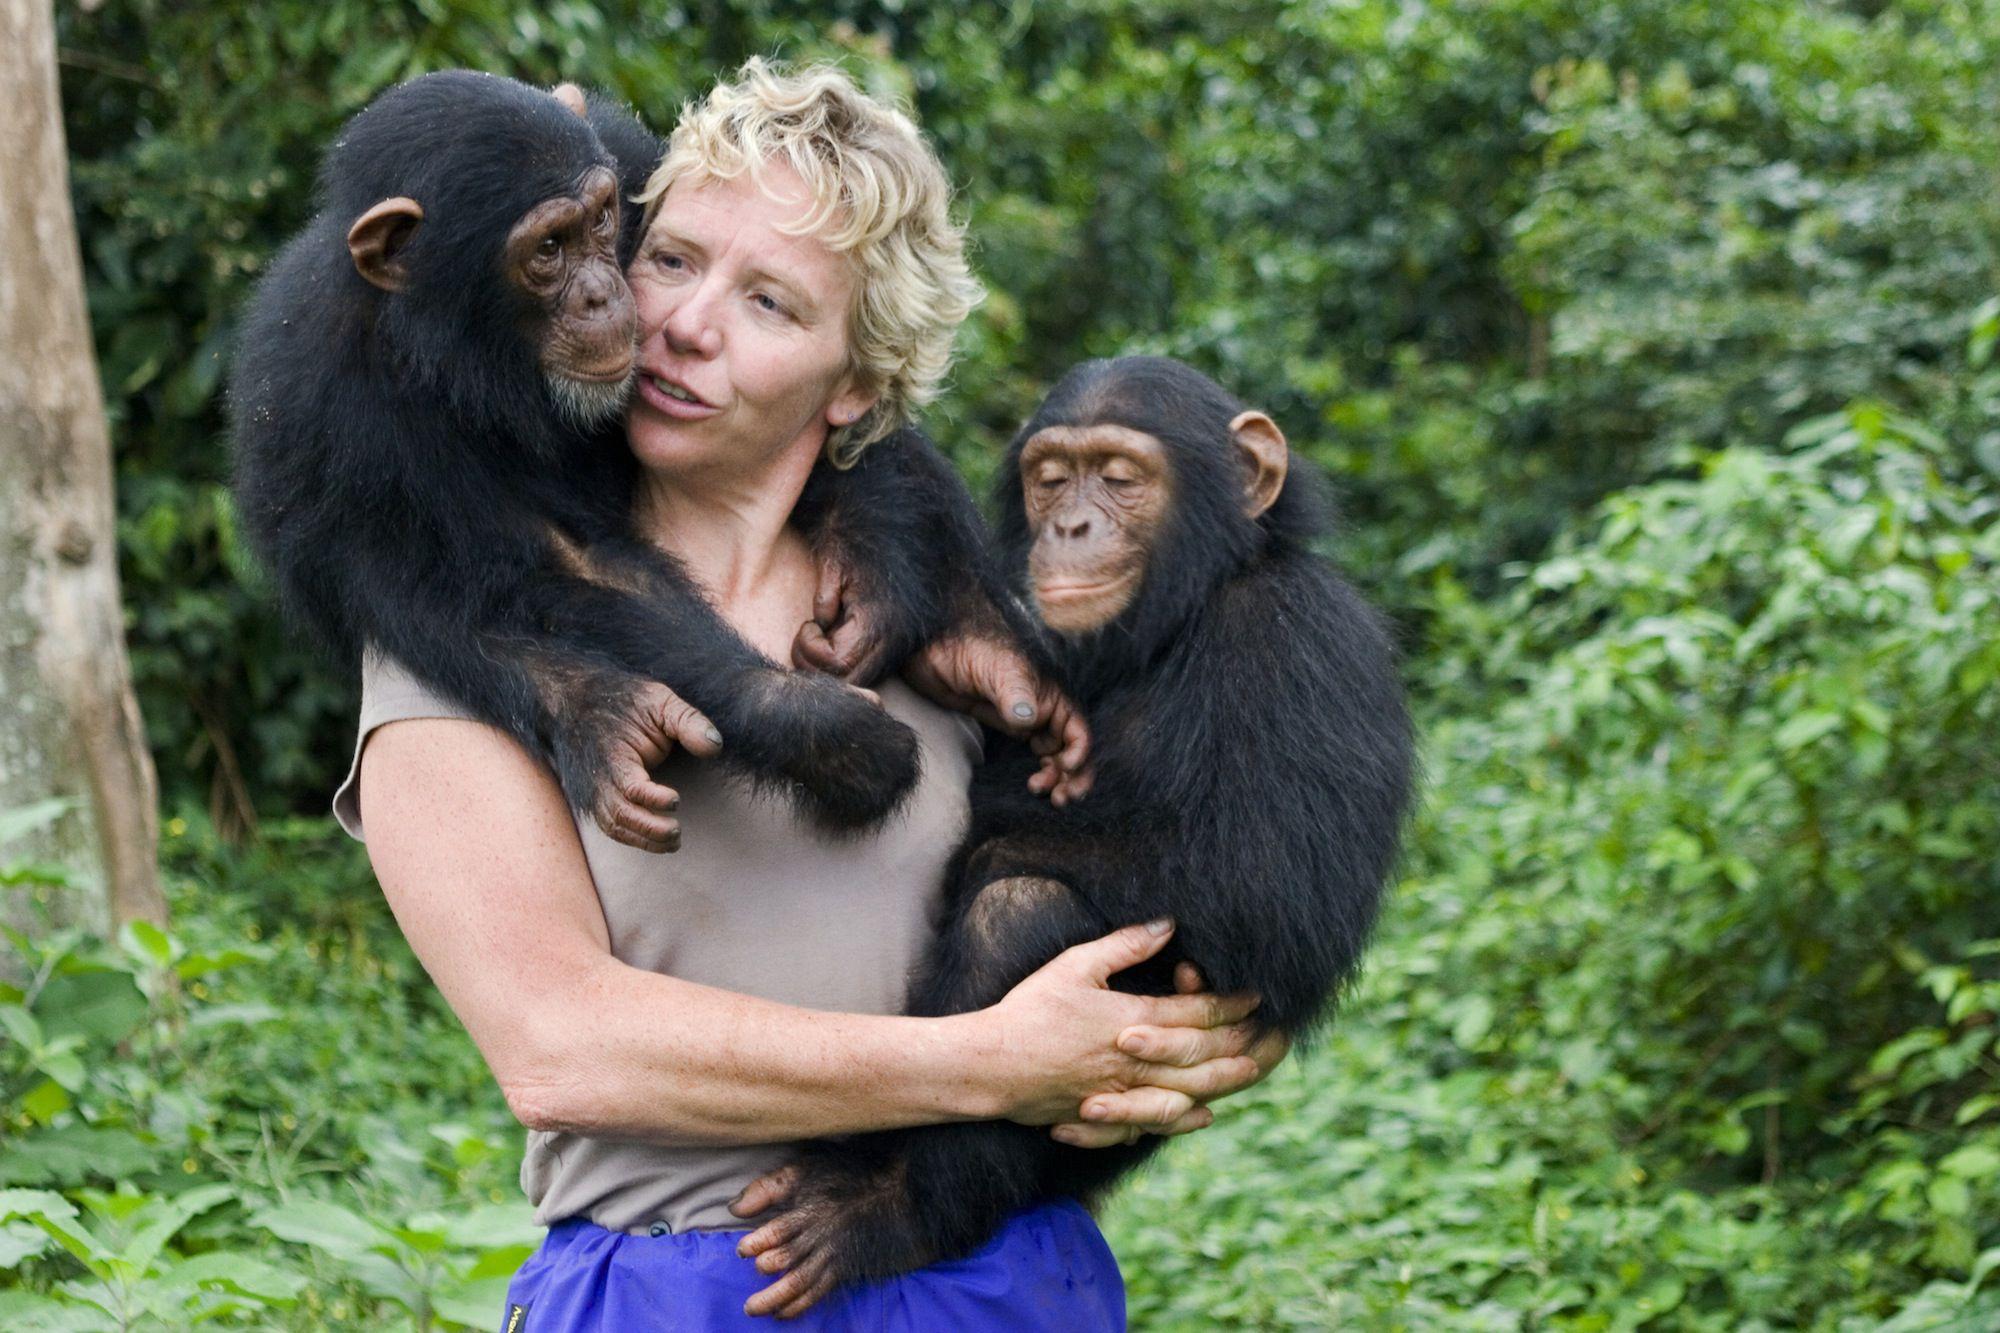 become one with the gorillas primatologist job outlook - Wildlife Biologist Job Description